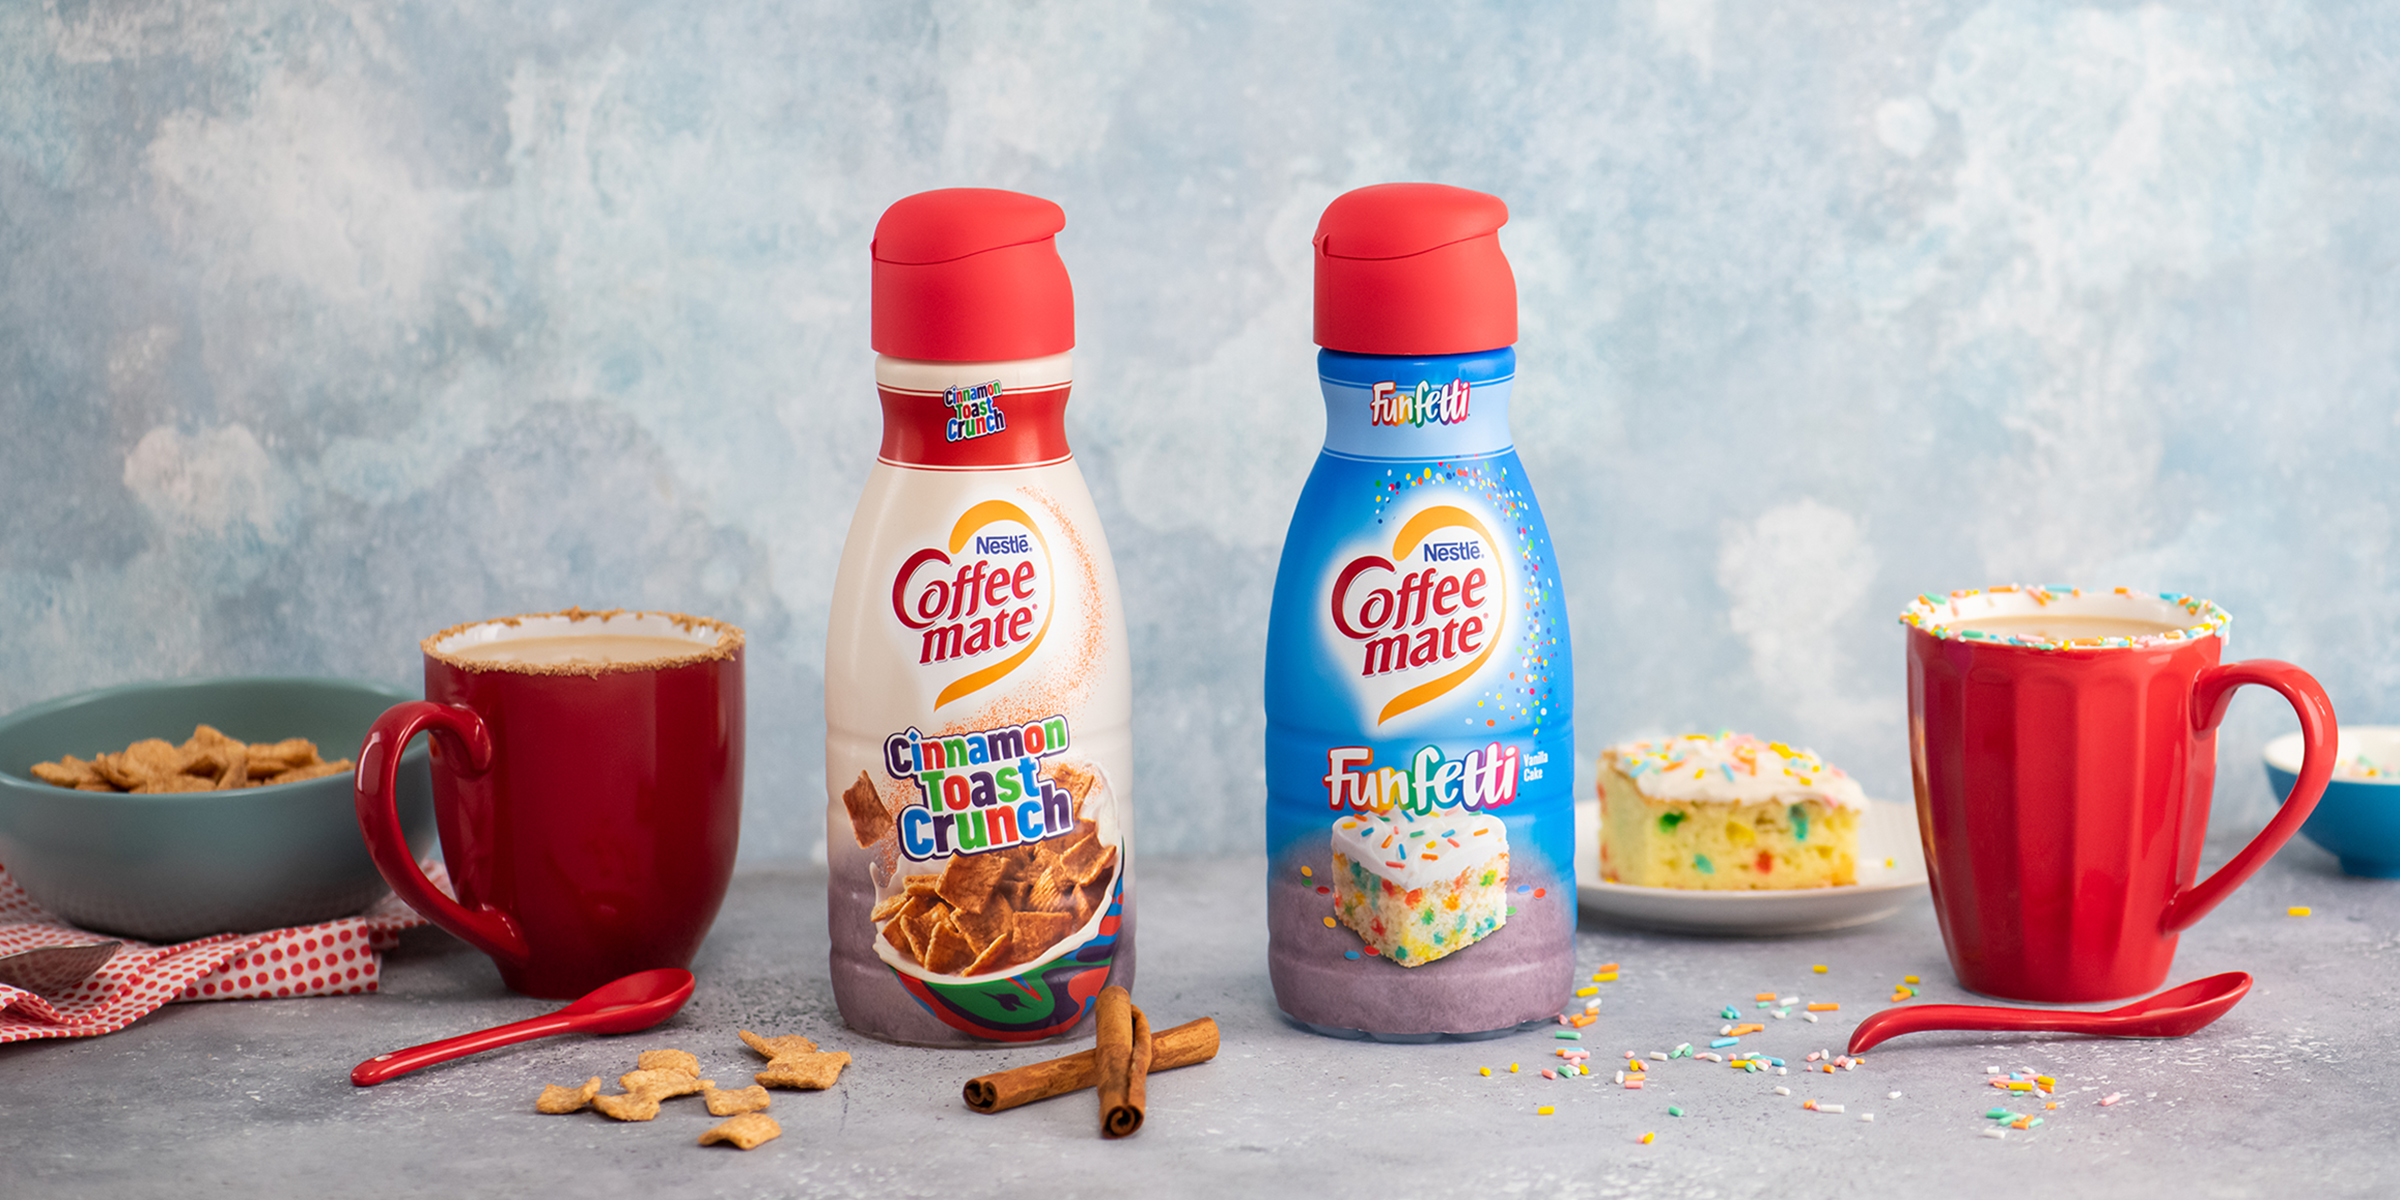 Coffee Mate Is Offering Cinnamon Toast Crunch Funfetti Creamers